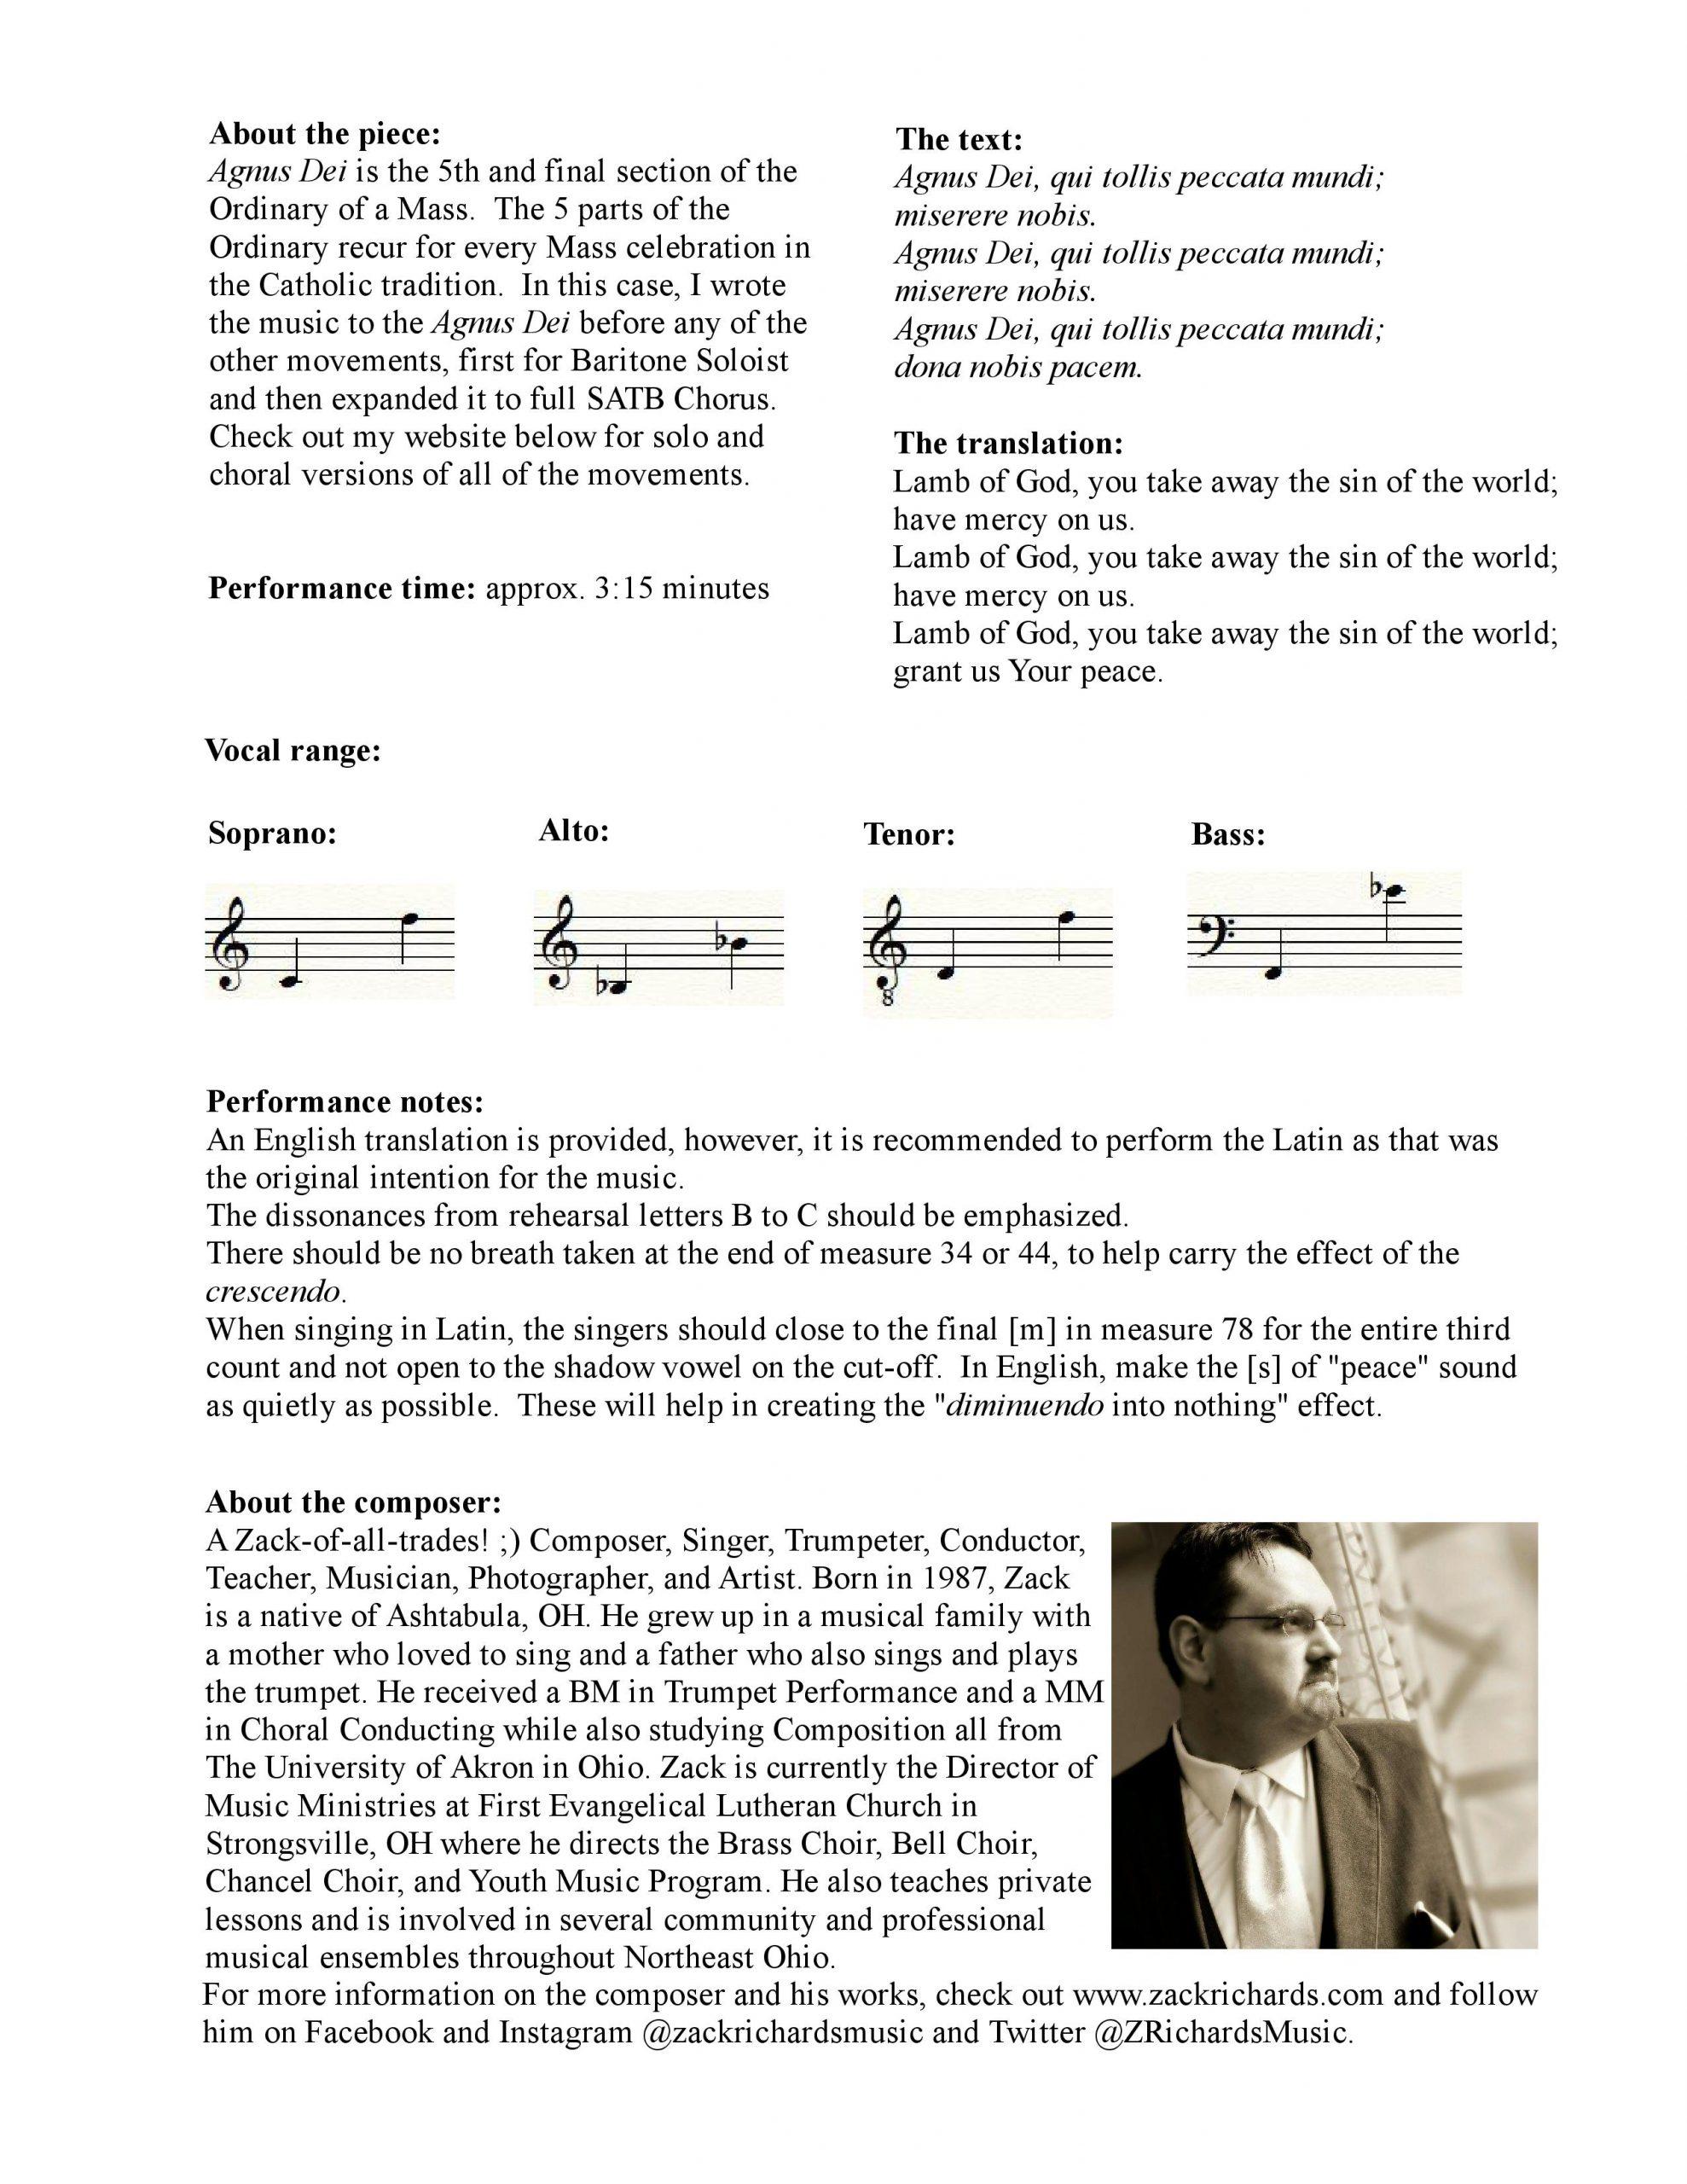 Agnus Dei (Lamb of God) for SATB Choir and Piano